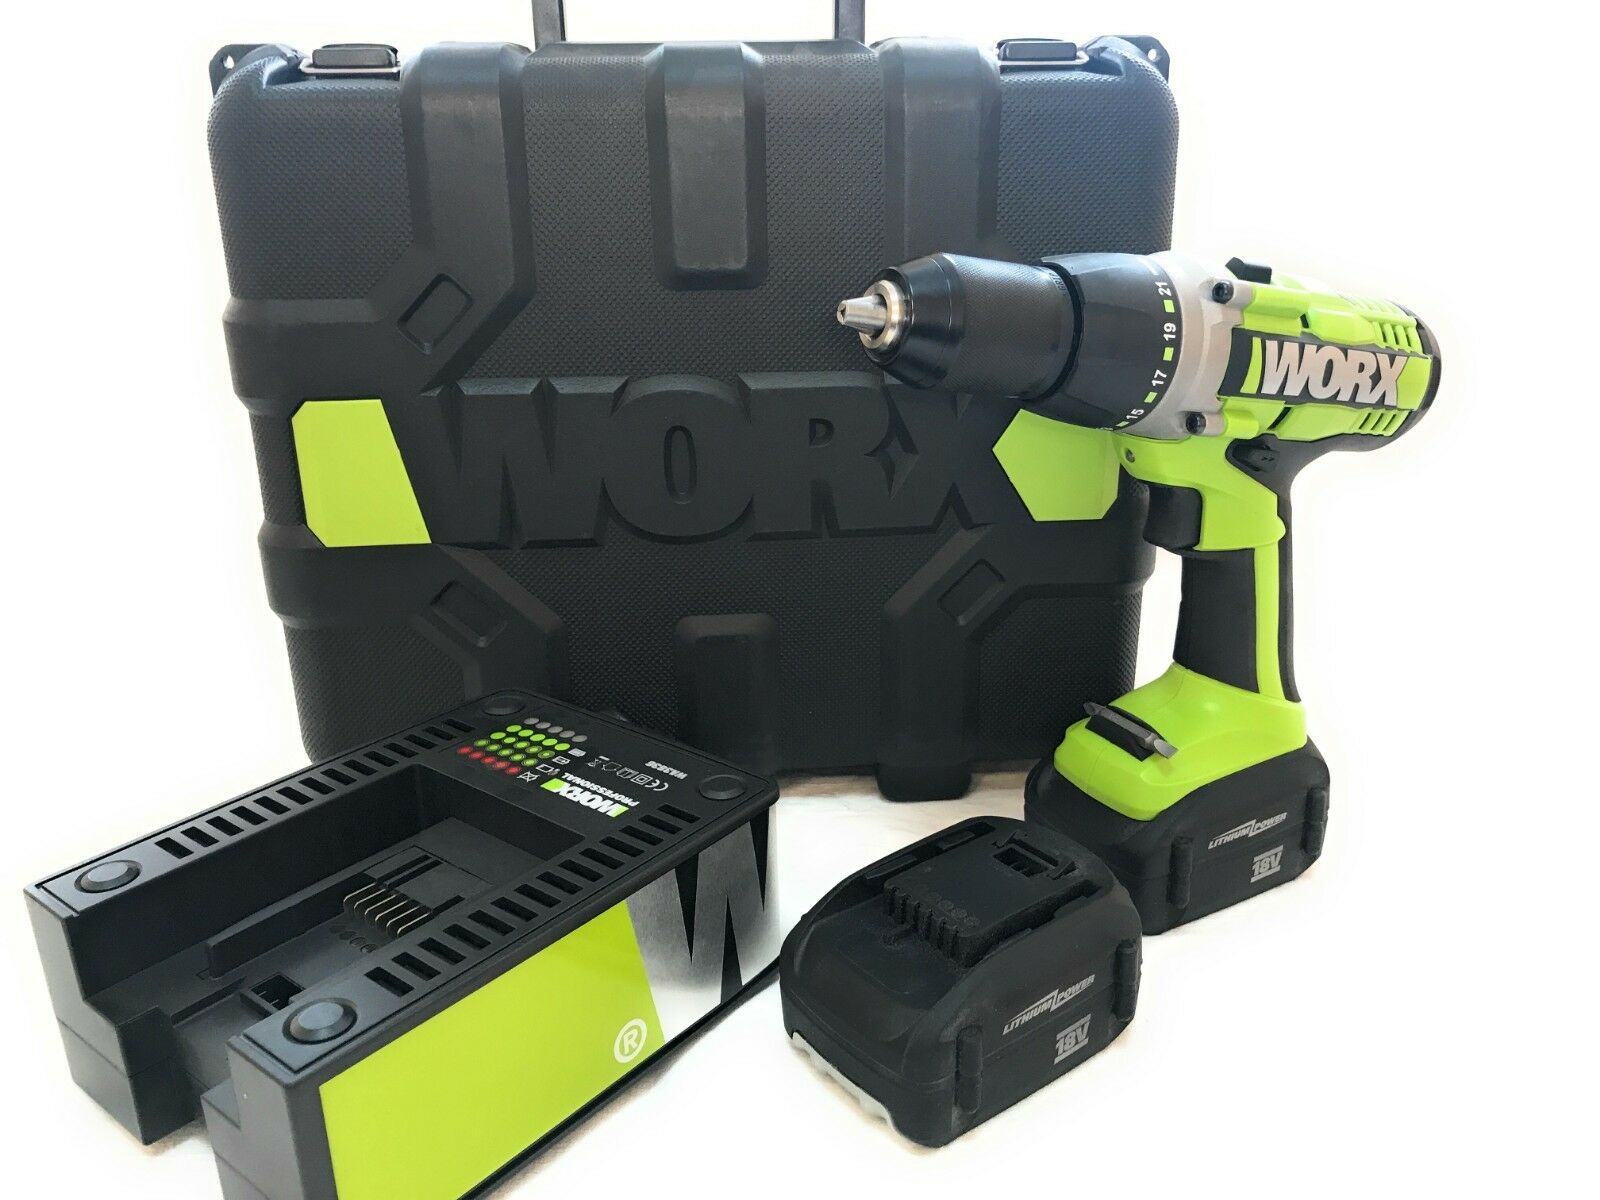 WORX Cordless Drill WU166 PROFESSIONAL 18V/2,6Ah